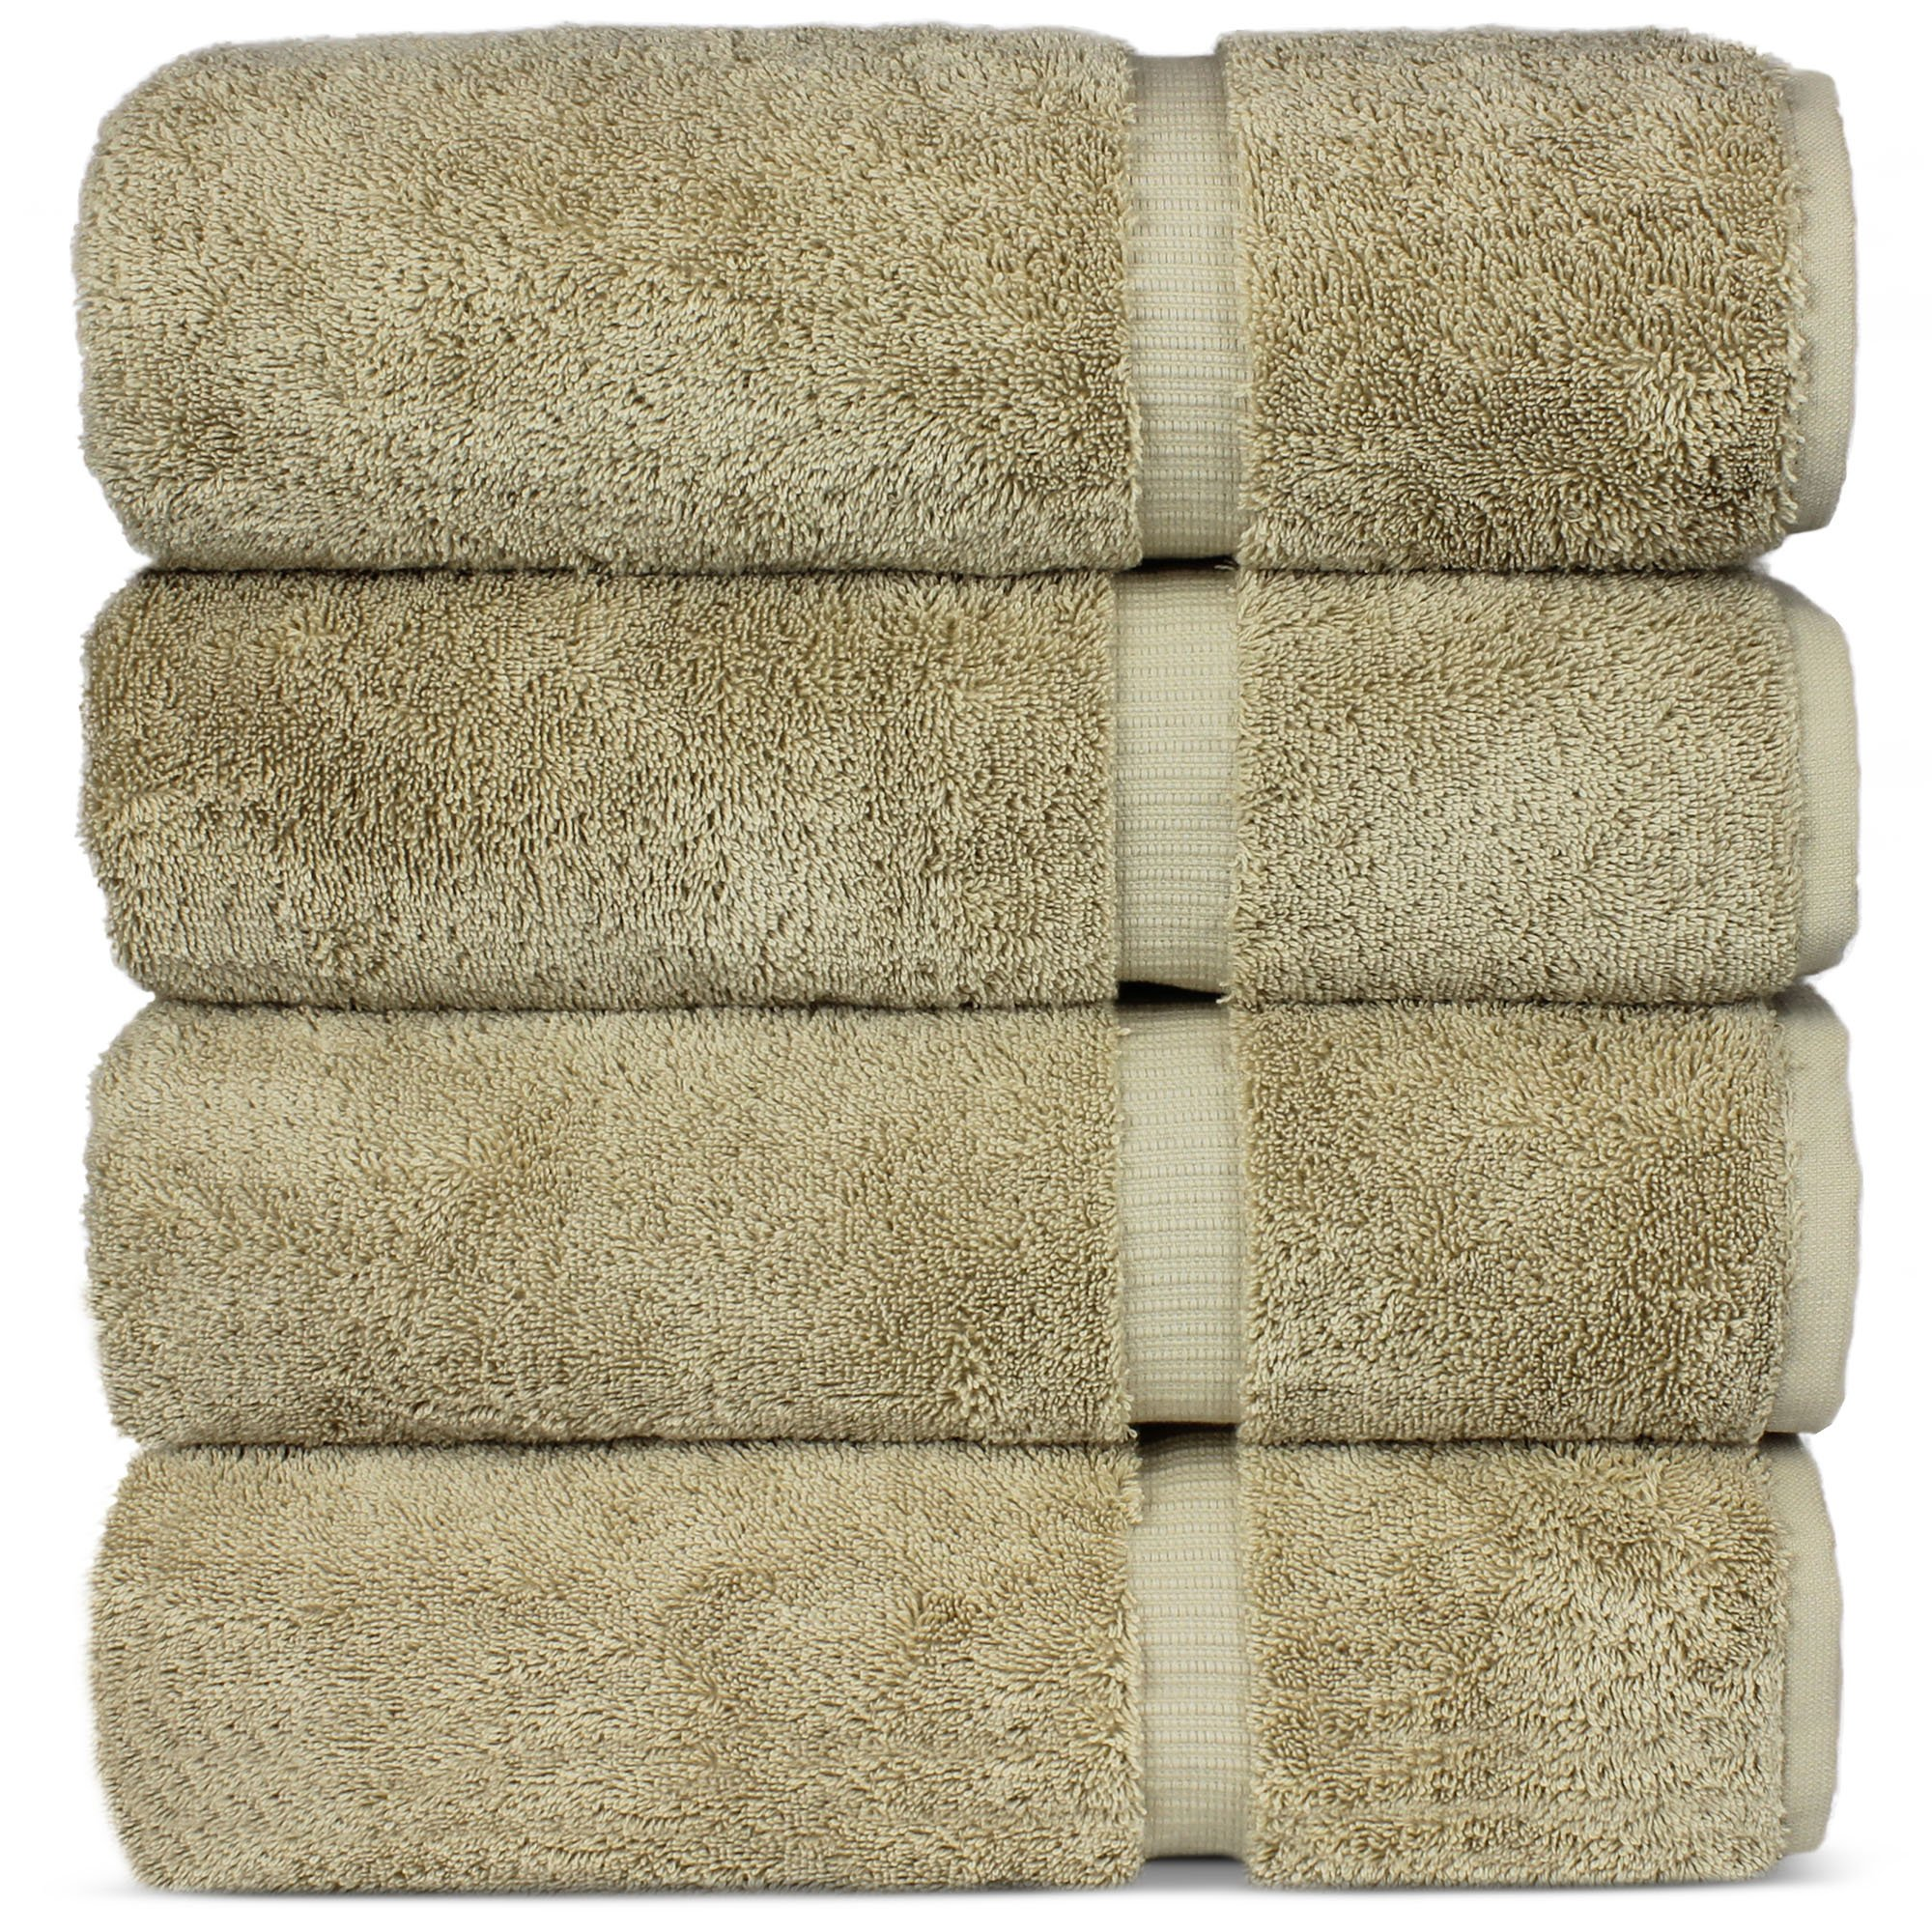 Luxury Premium long-stable Hotel & Spa Turkish Cotton 4-Piece Eco-Friendly Bath Towel Set (Driftwood) by Chakir Turkish Linens (Image #5)